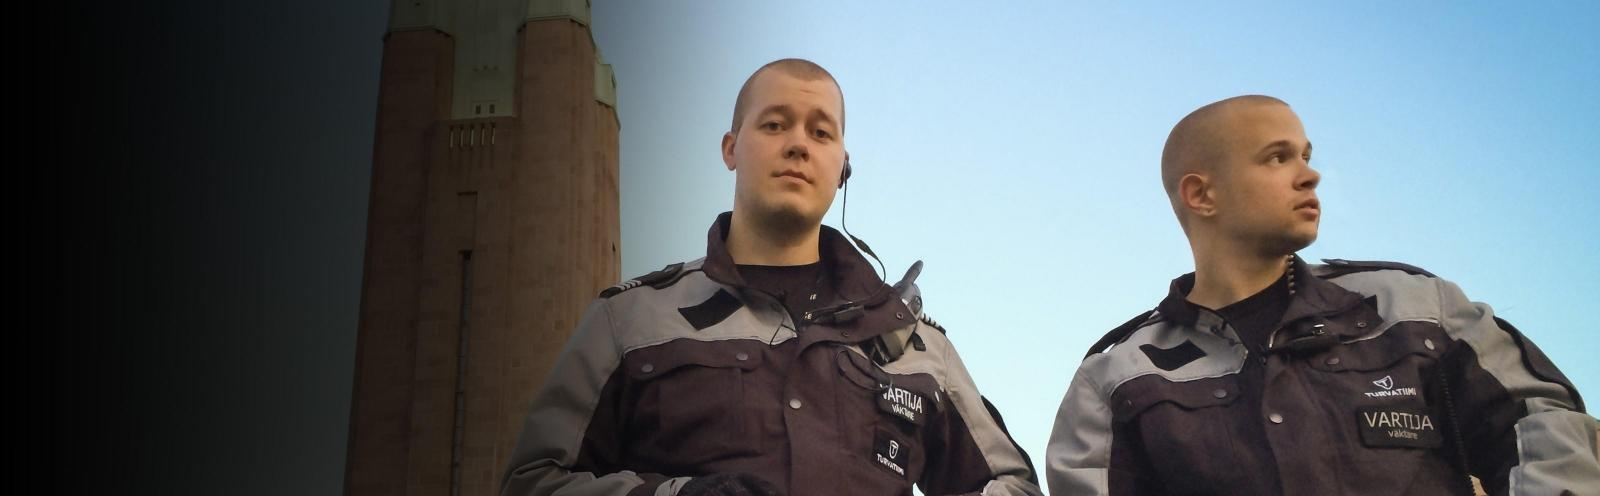 Suomen vartijat